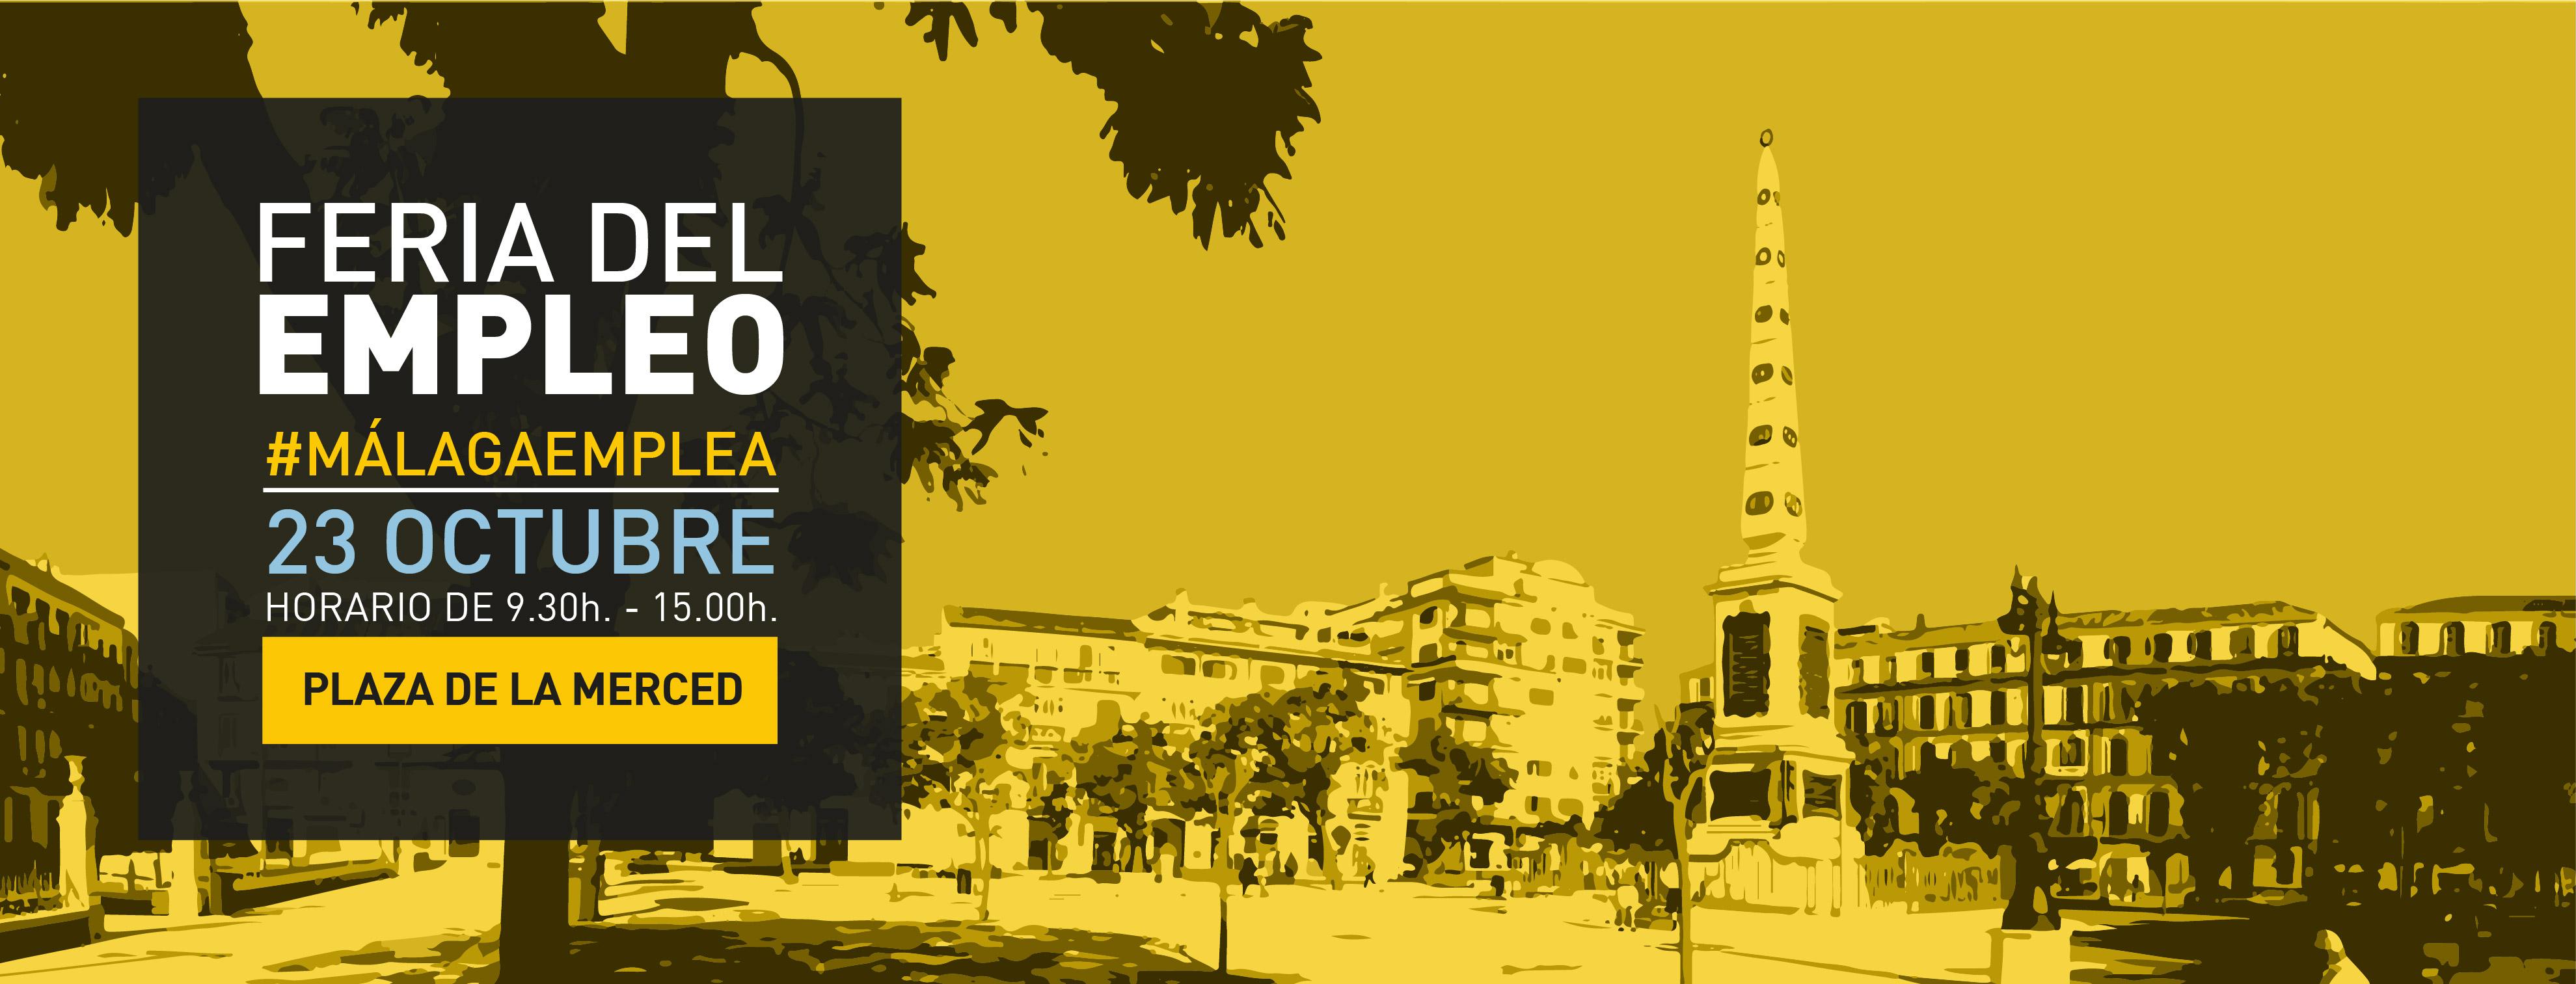 feria de empleo Málaga